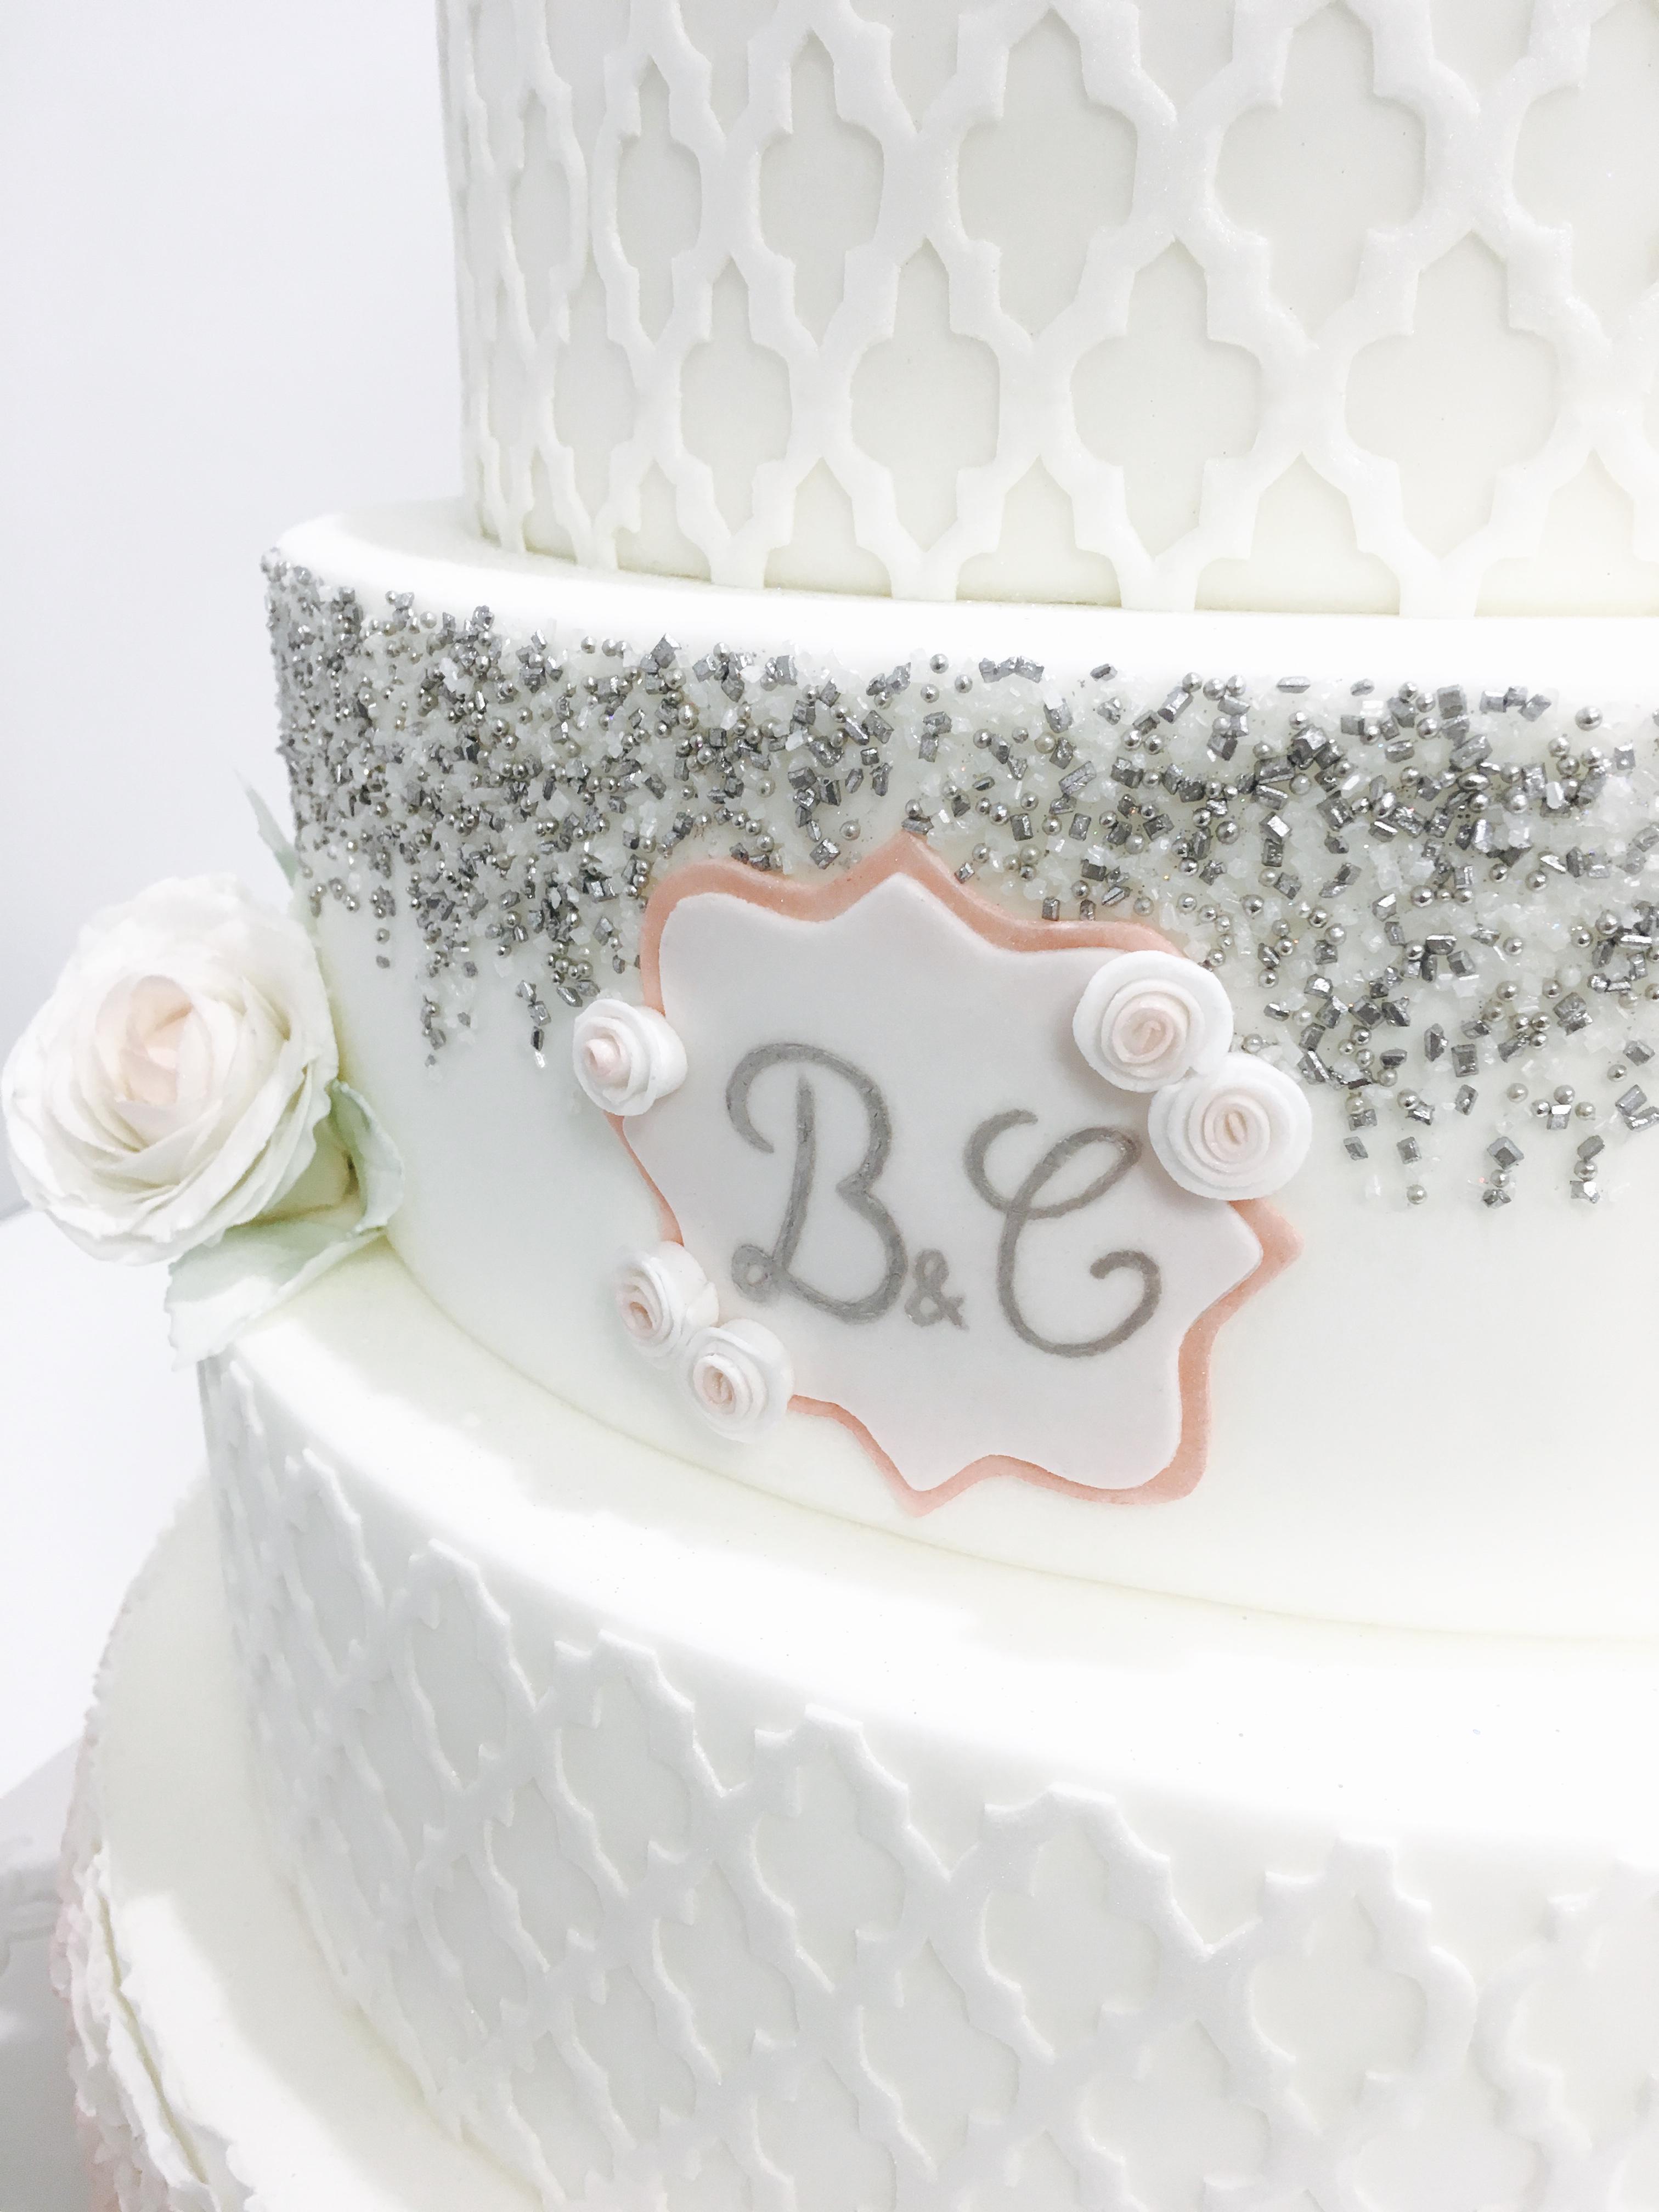 Gâteau Mariage - Perles - Cakeapart